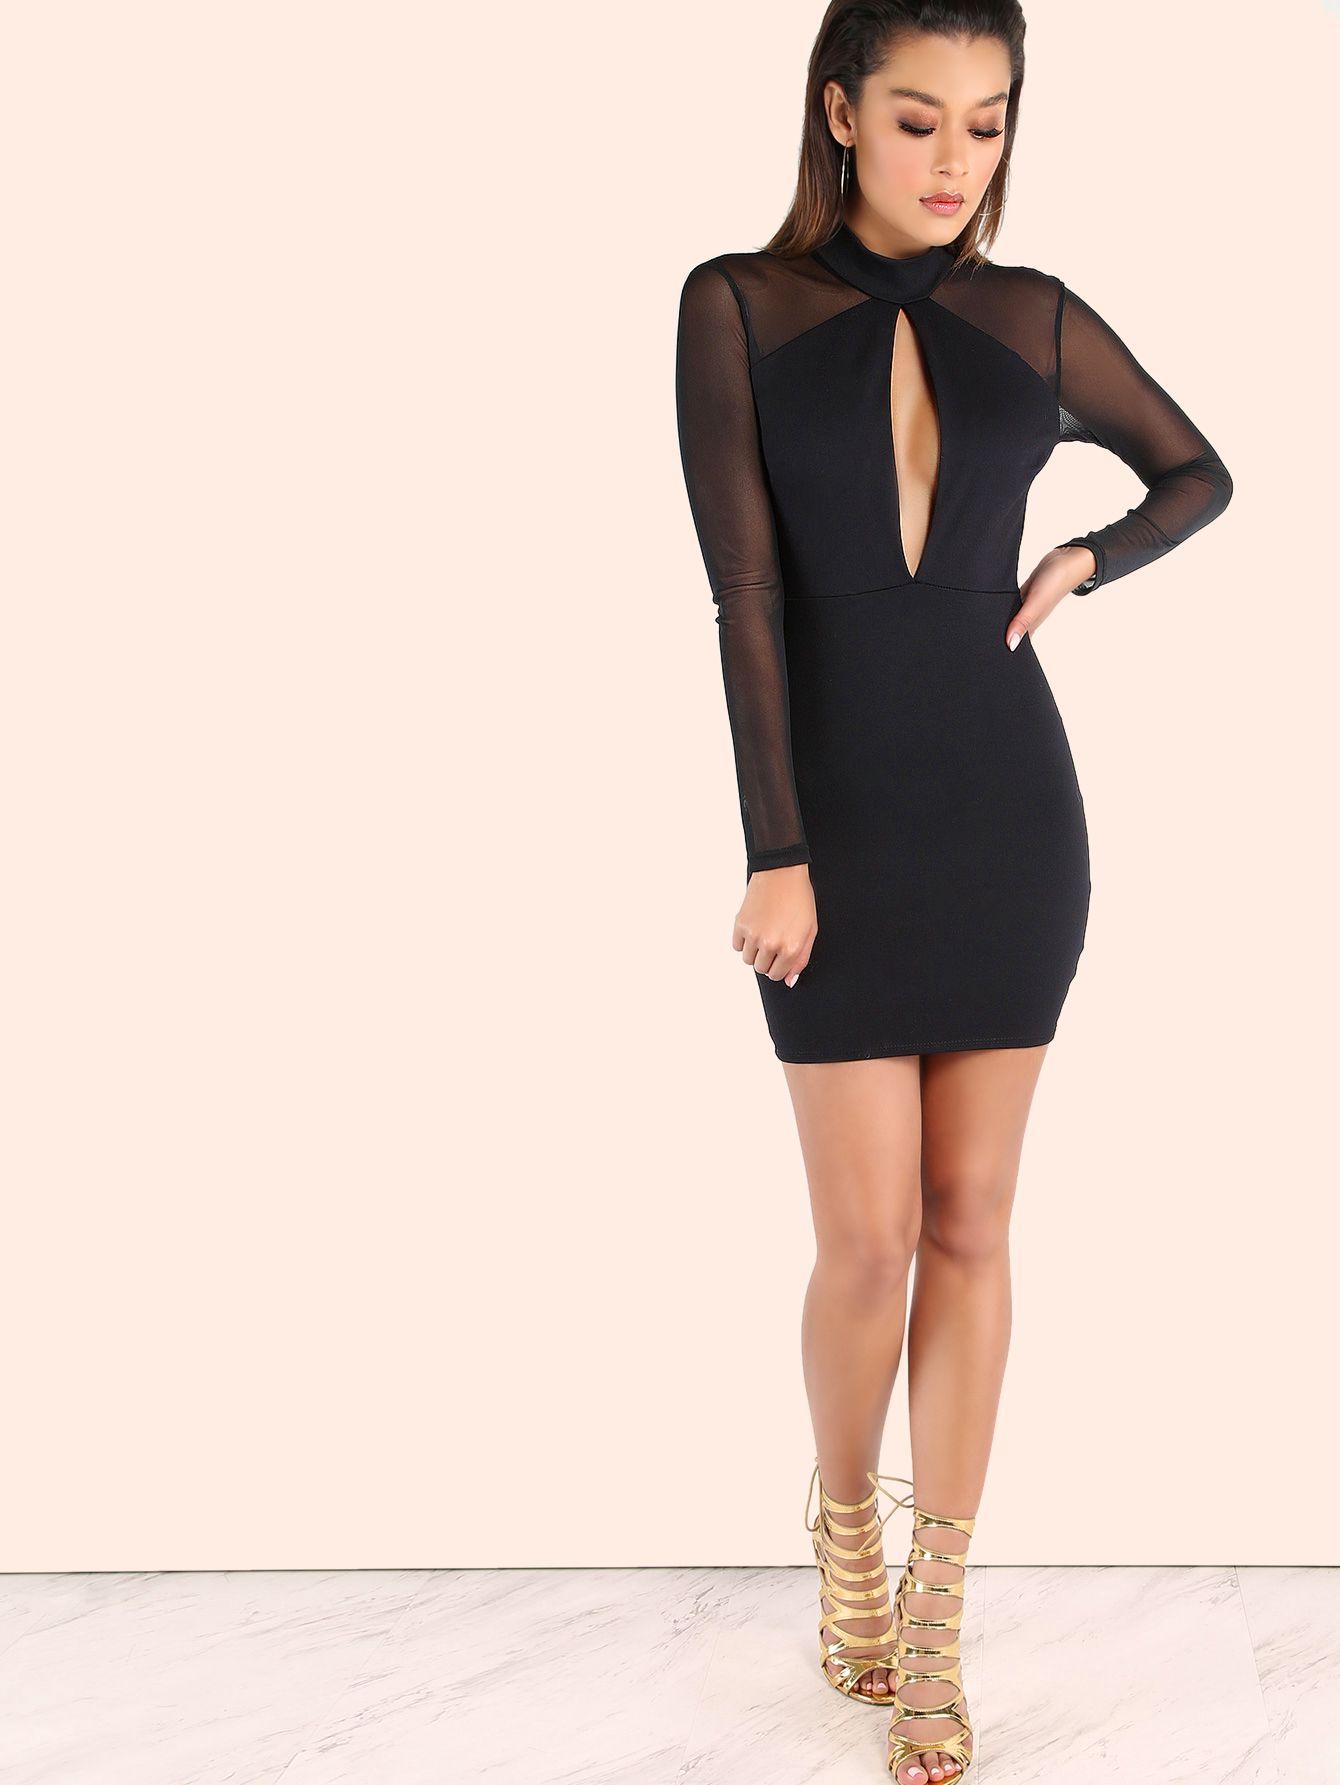 Shop Turtleneck Peakaboo Mesh Sleeved Bodycon Dress Black Online Shein Offers Turtleneck Peakaboo Bodycon Dress With Sleeves Black Bodycon Dress Bodycon Dress [ 1785 x 1340 Pixel ]